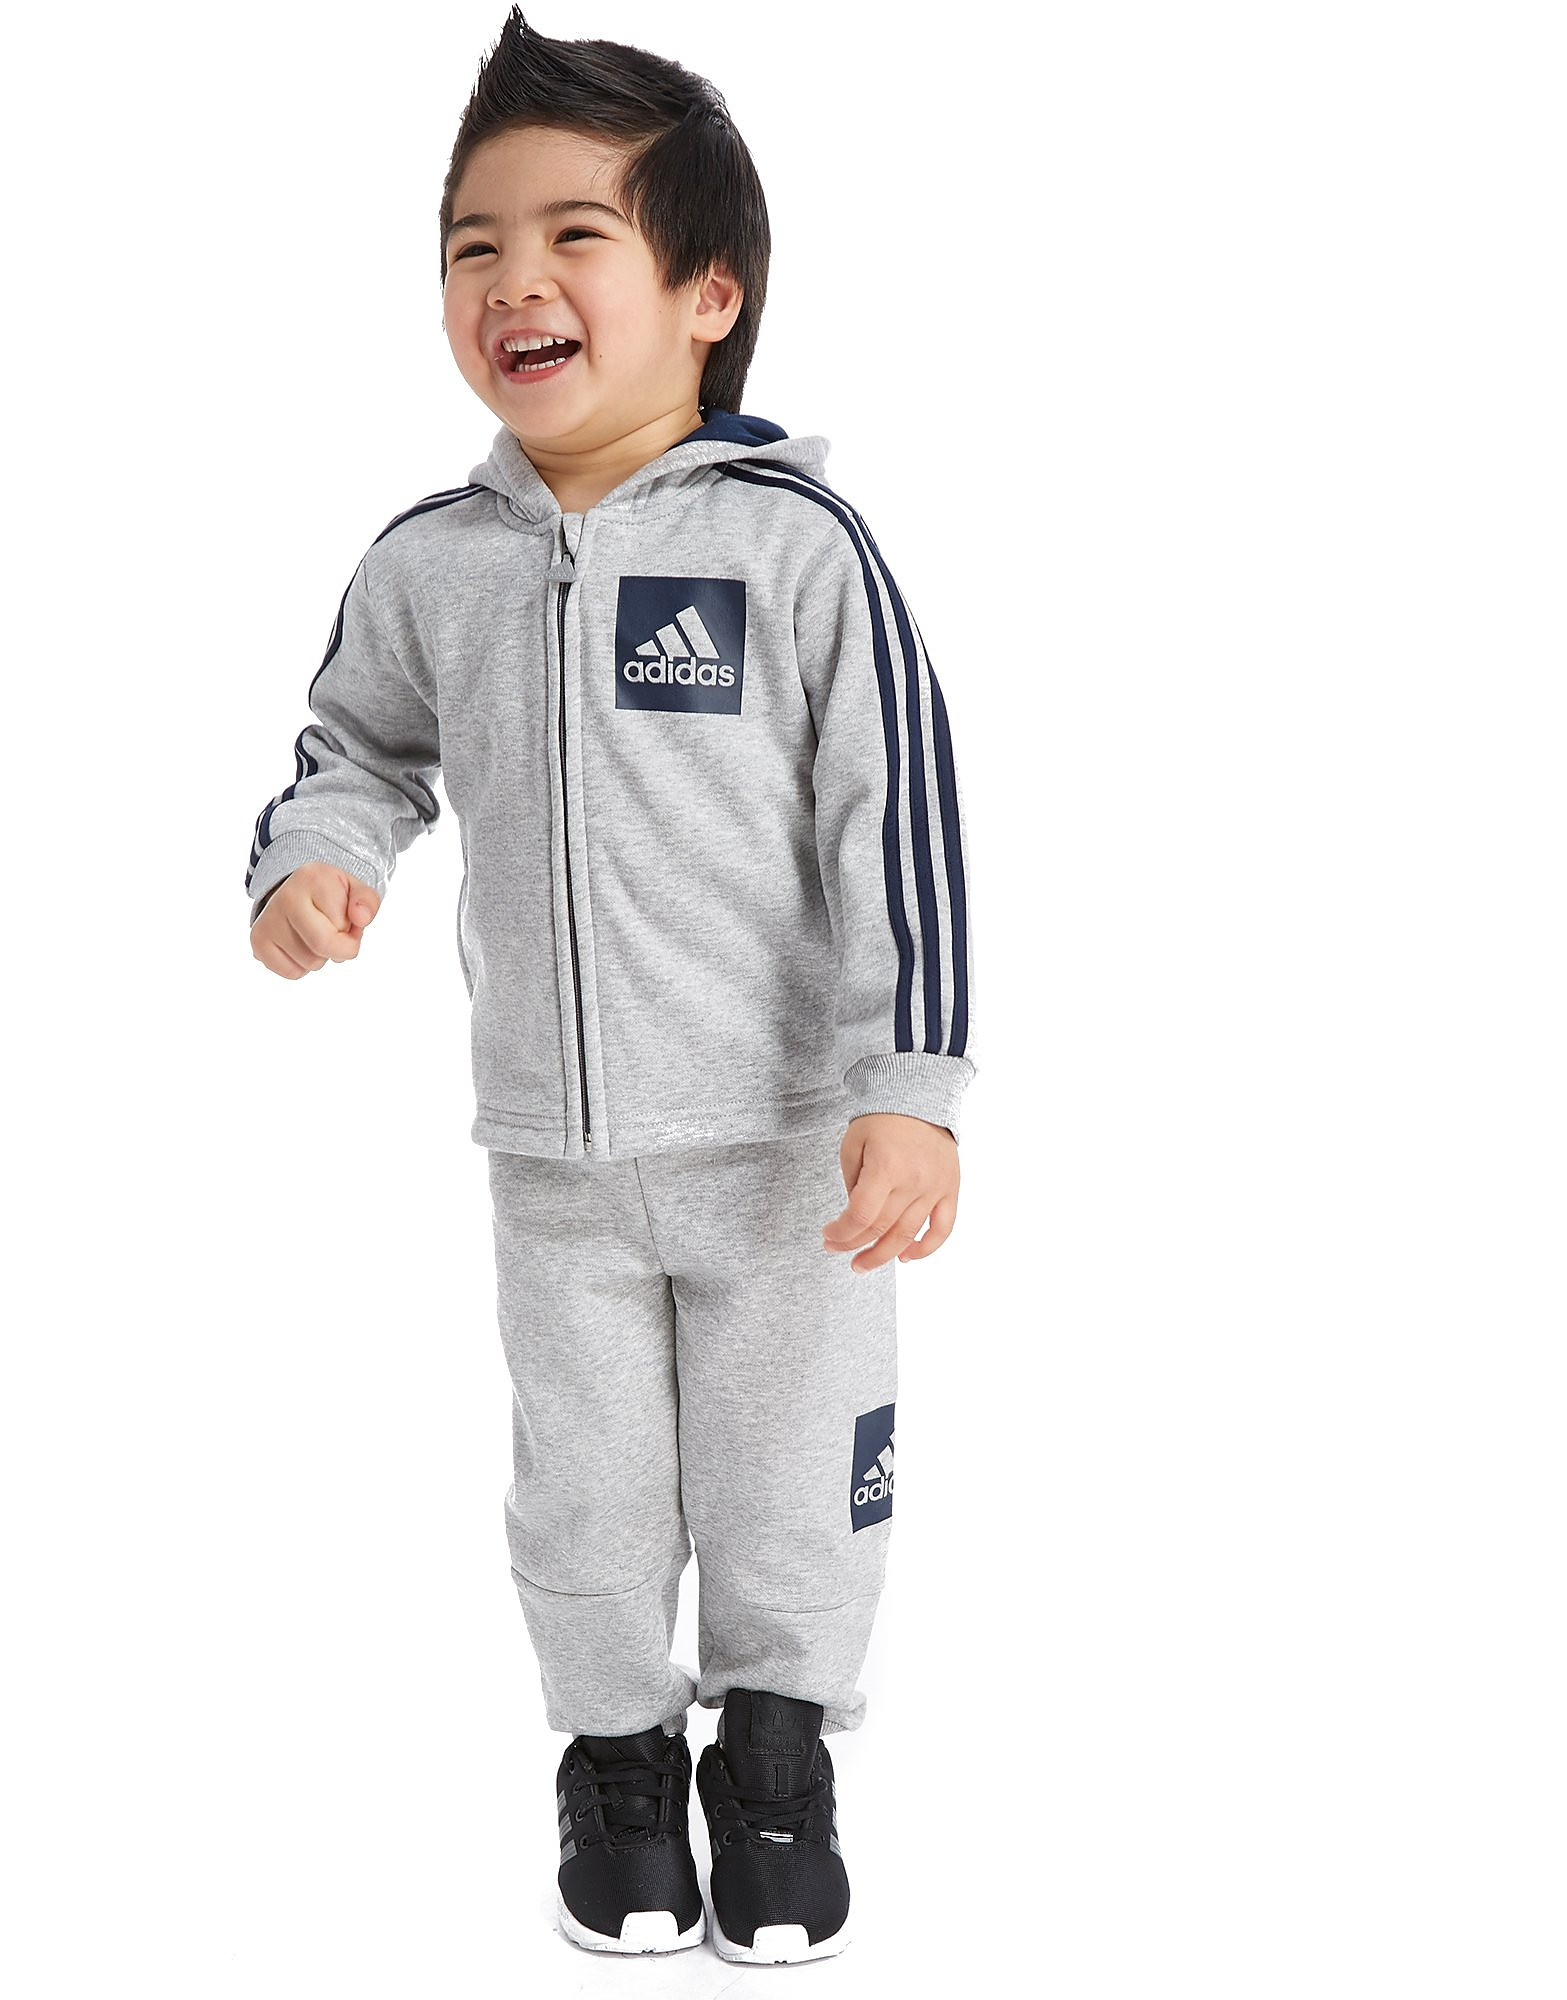 adidas 3-Stripes Essential Suit Infant